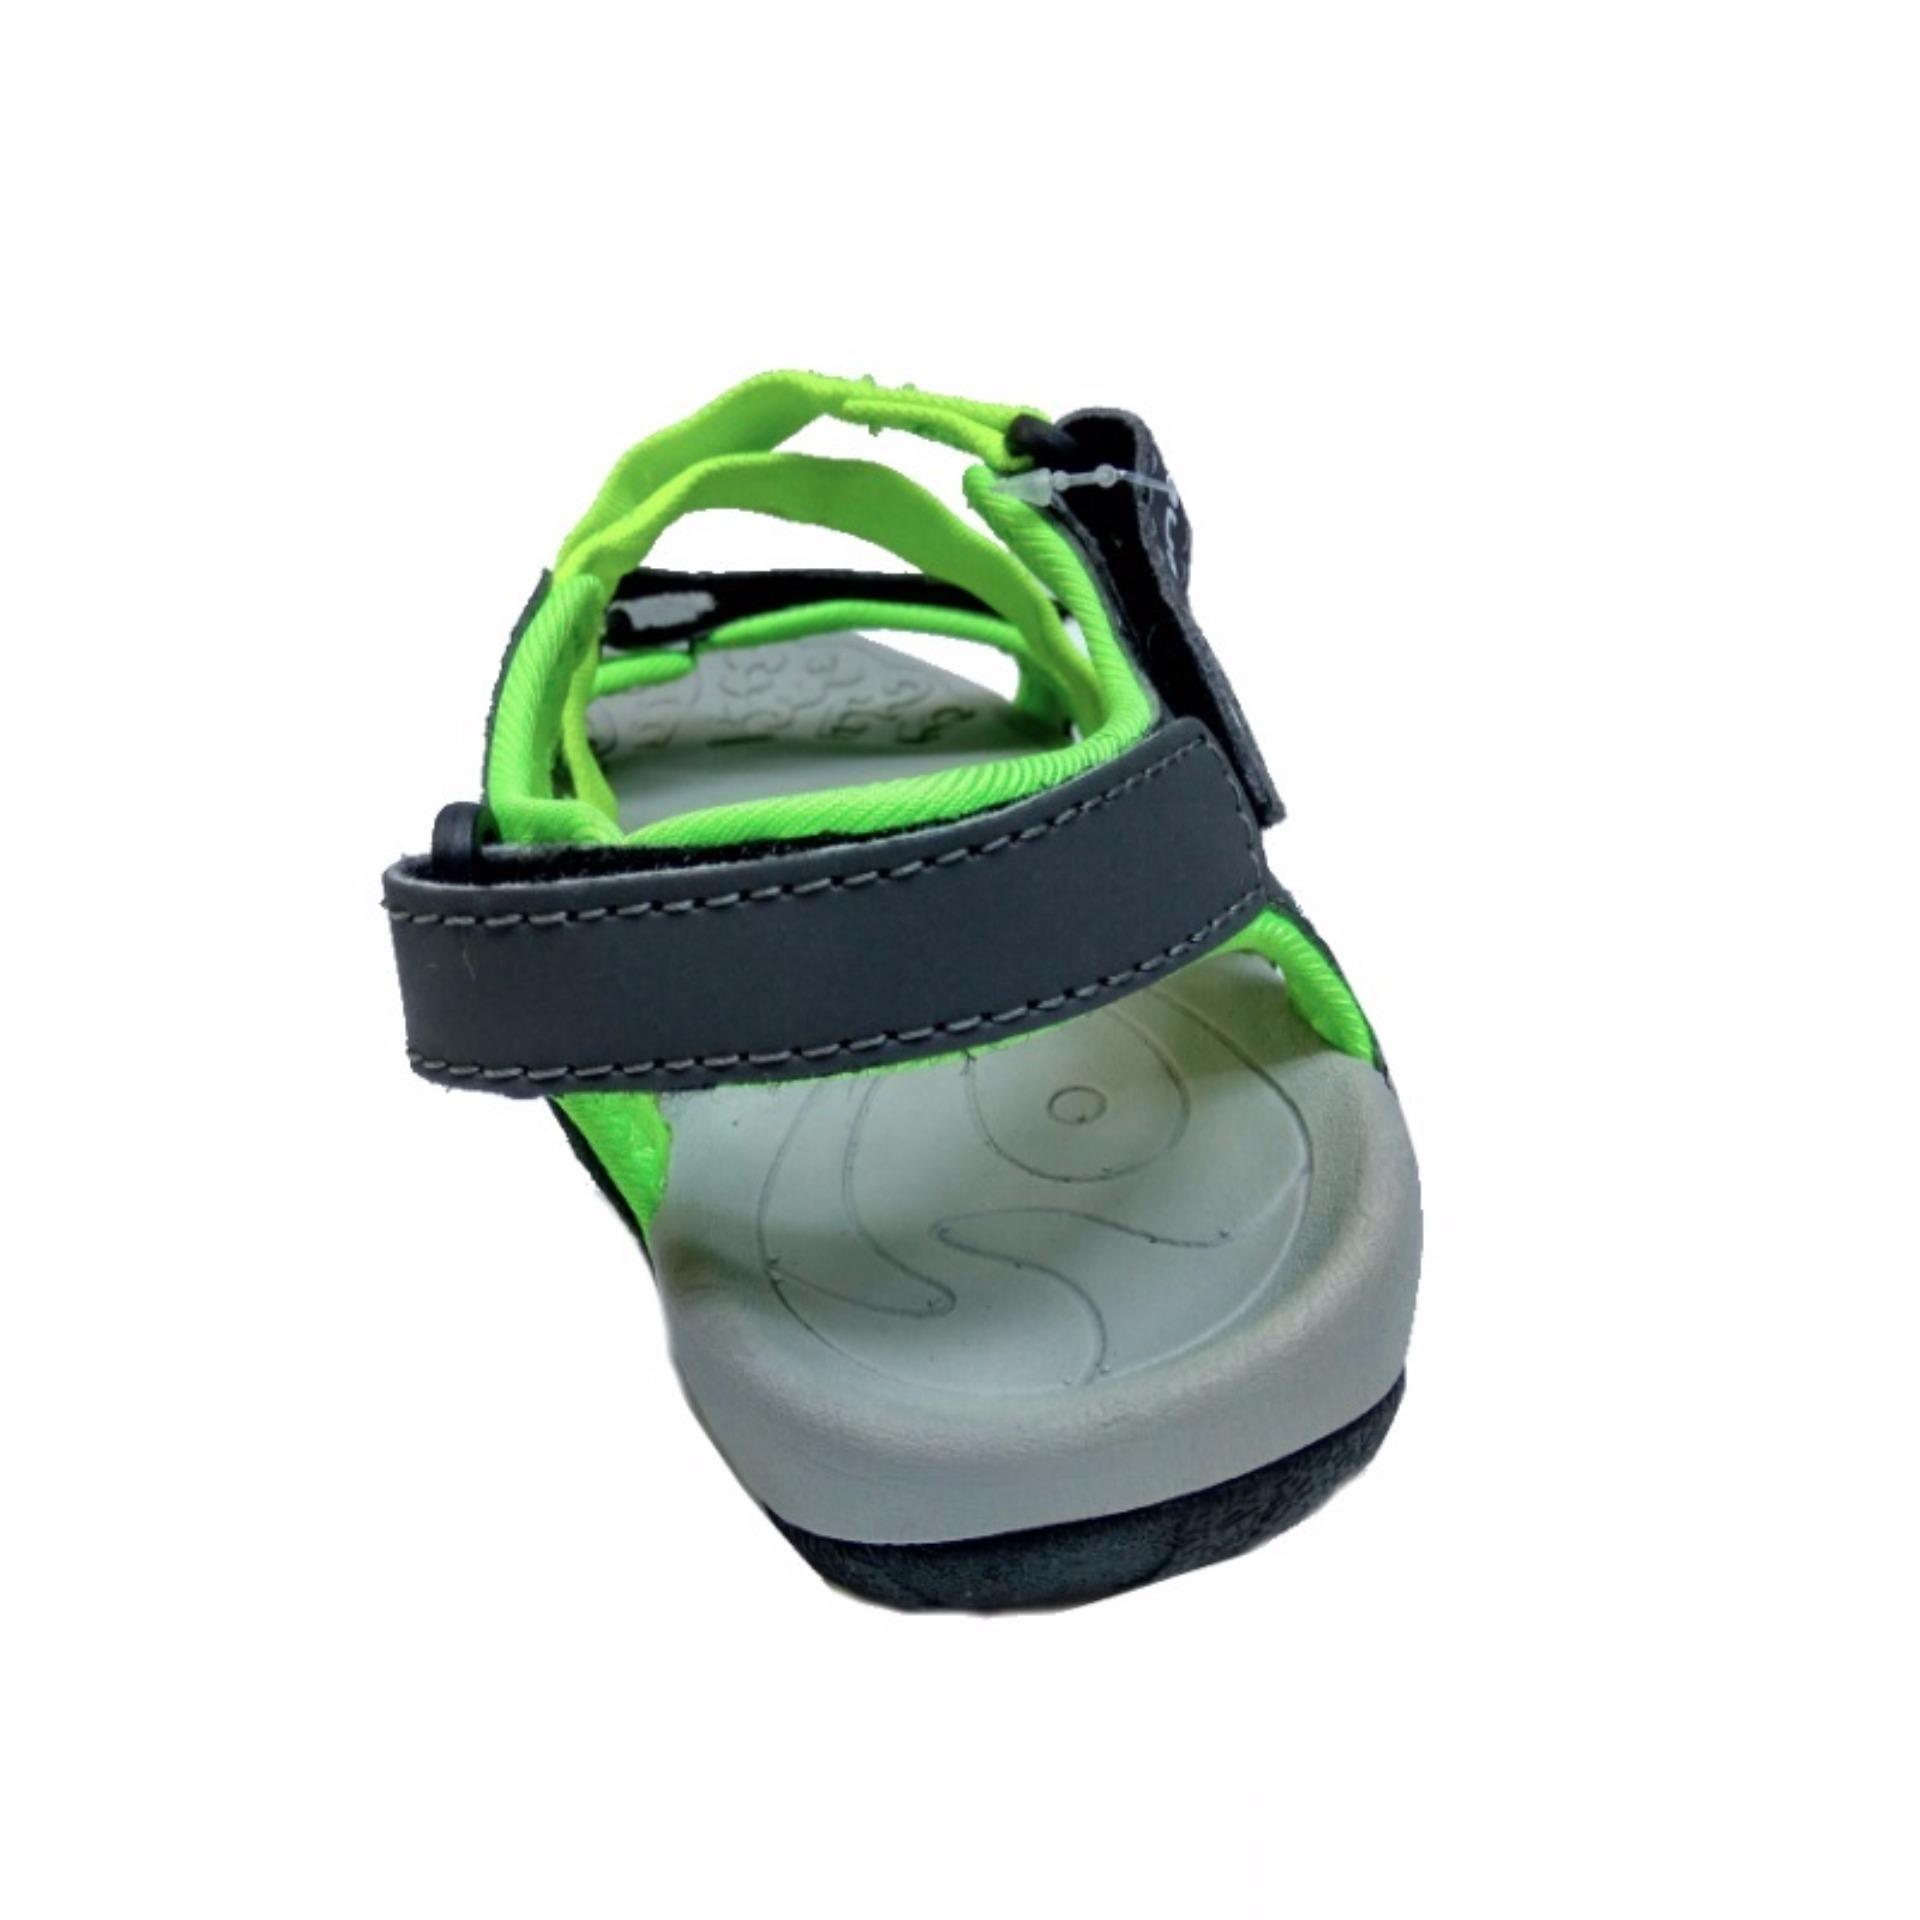 Sandal Gunung Dan Fashion Zcoland Green Update Daftar Harga Eiger Breezin Beanies M Kupluk Pria